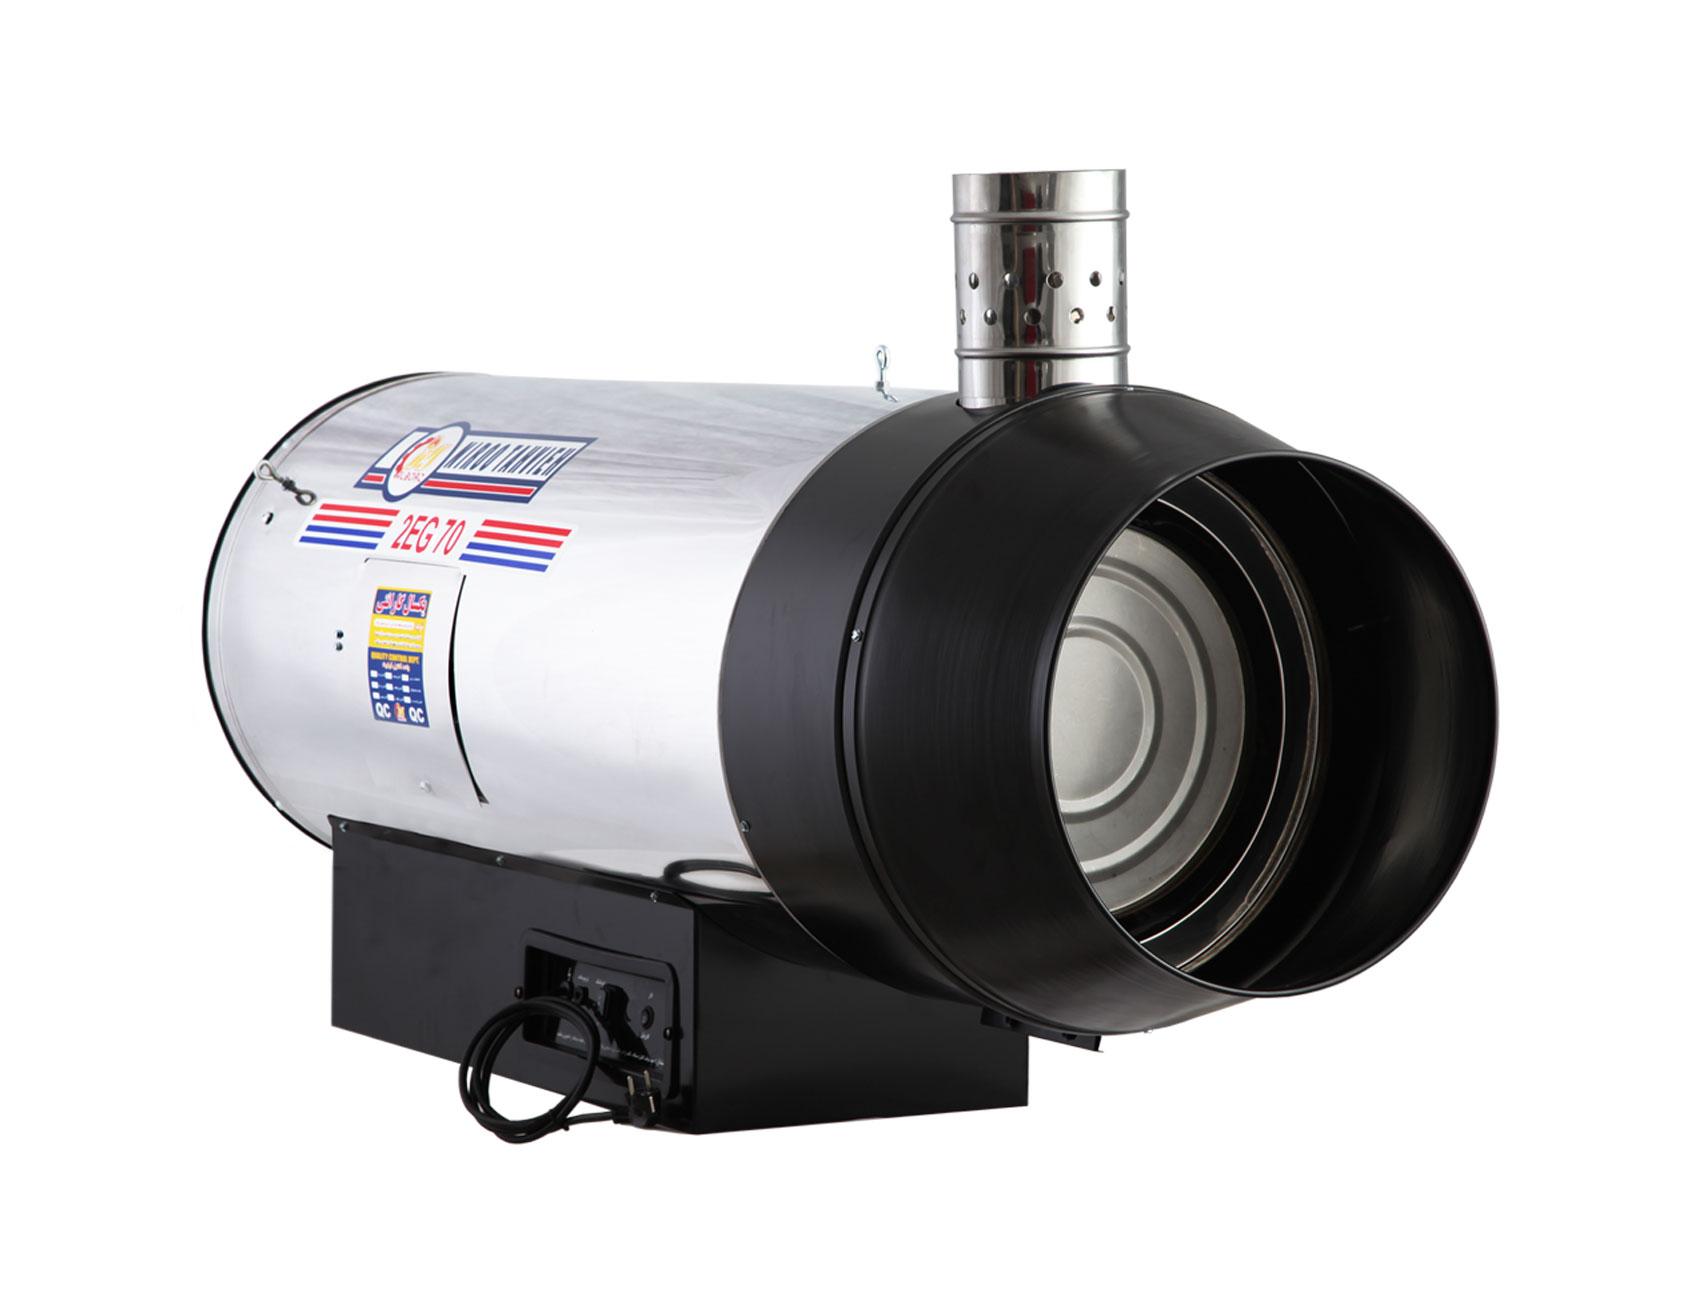 2EG-70 Jet Heater